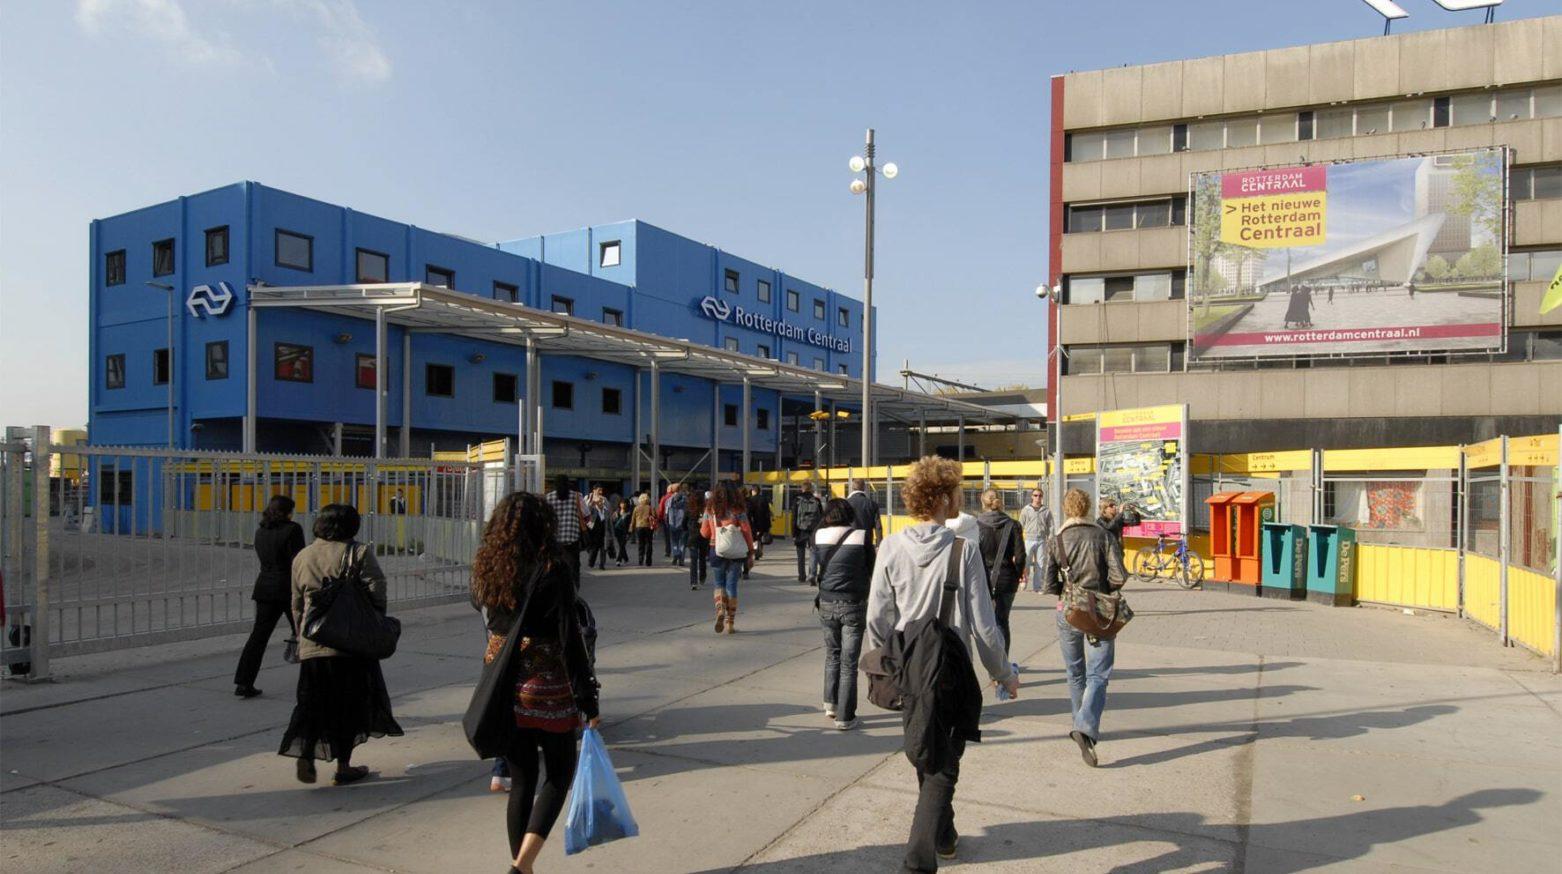 Centraal Station Rotterdam 13